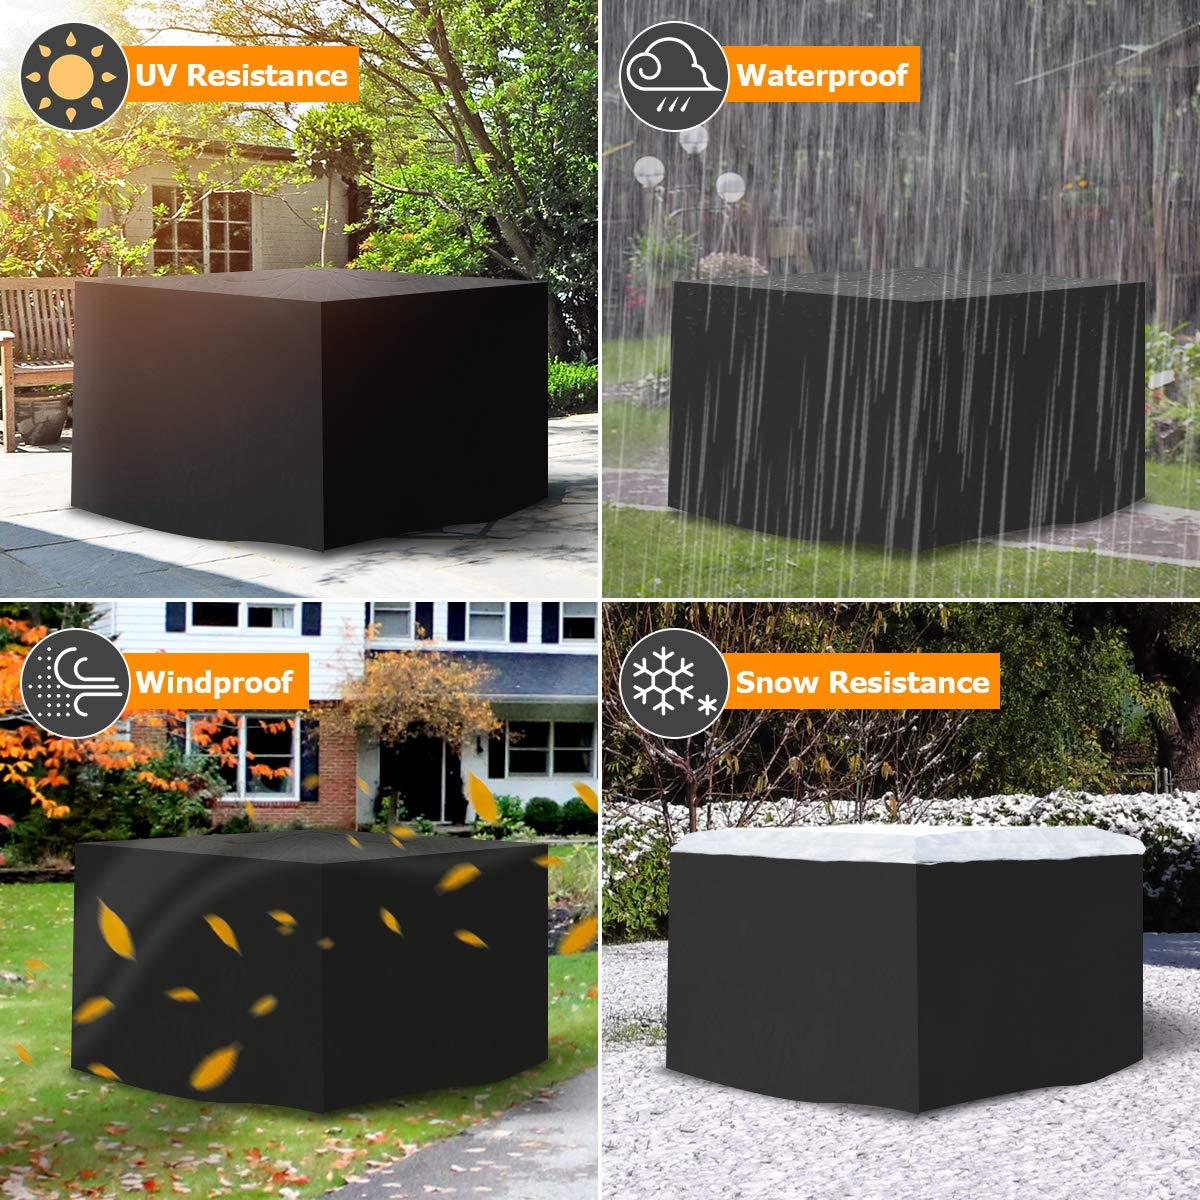 Tvird Funda para Muebles de Jard/ín,Copertura Impermeable para Mesas Rectangular,Cubierta de Exterior Funda Protectora Muebles Mesas Sillas Sof/ás Exterior 420D Oxford 125x125x74cm Negro.